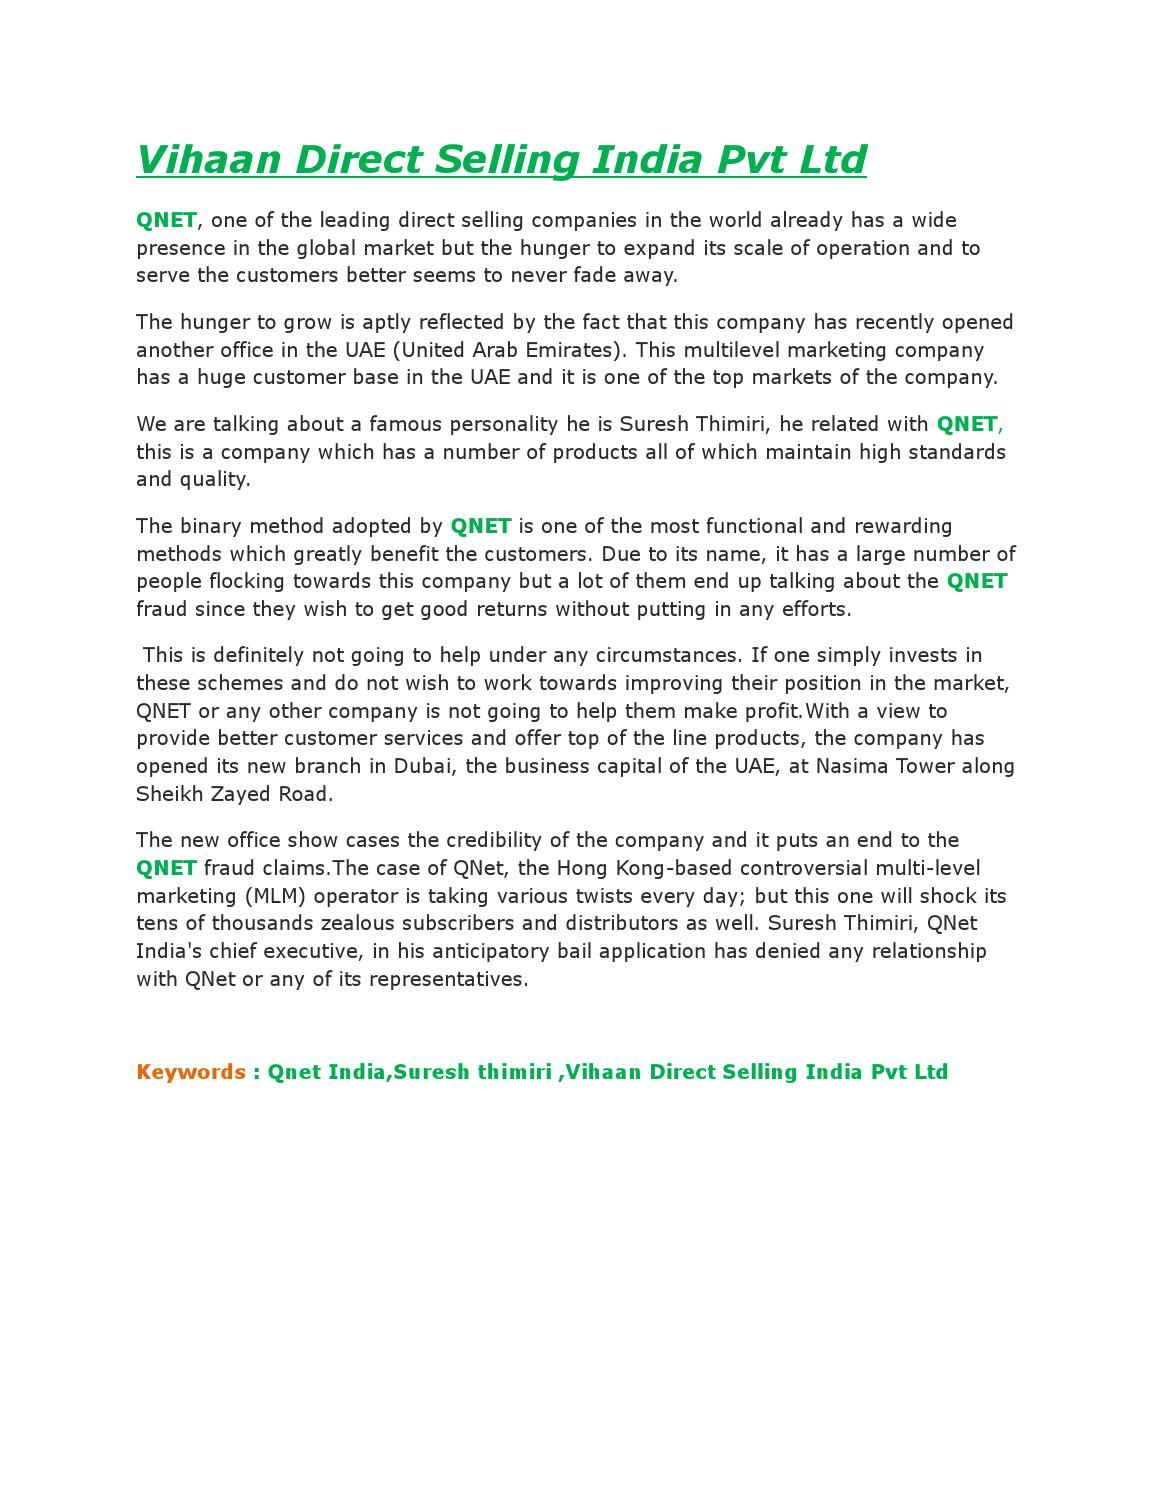 Vihaan direct selling india pvt ltd | Qnet India | Direct